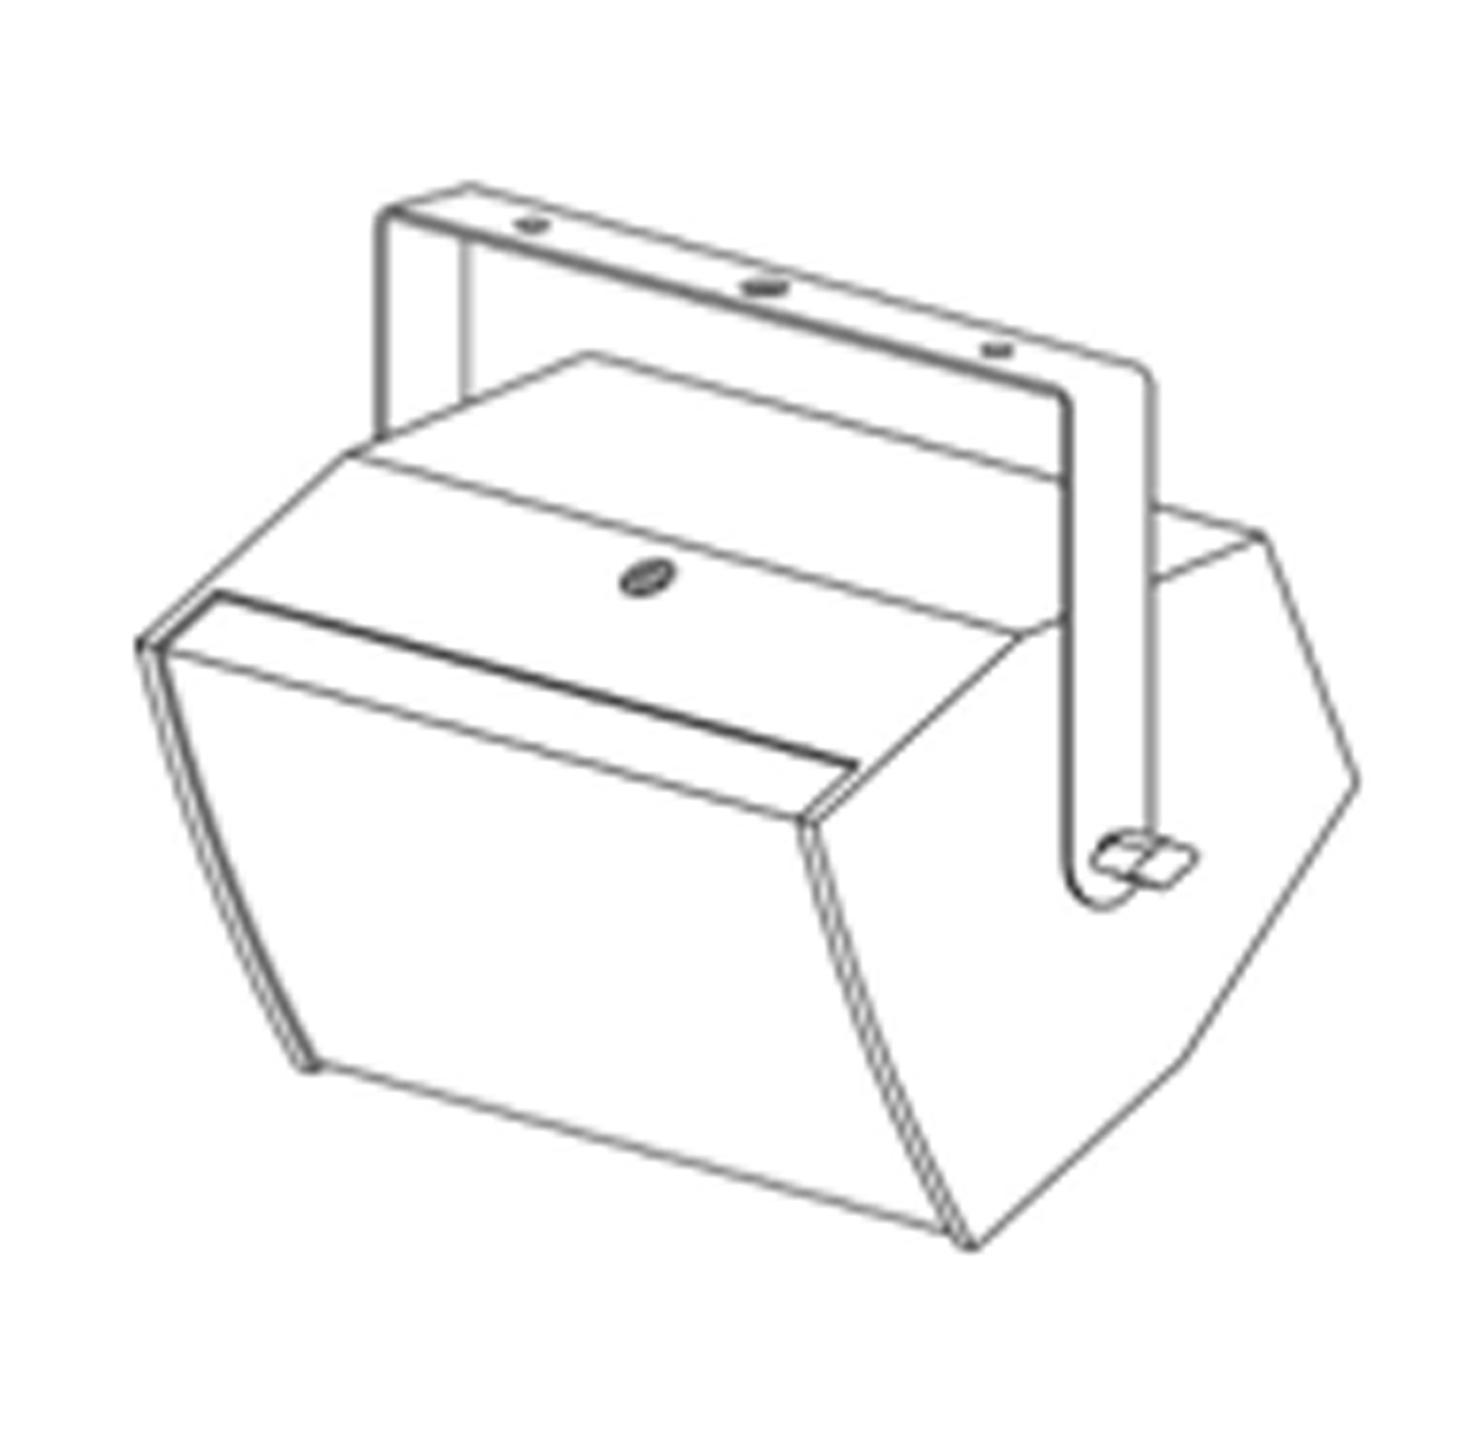 EM Acoustics EMS-51 - Horizontal Hanging Bracket